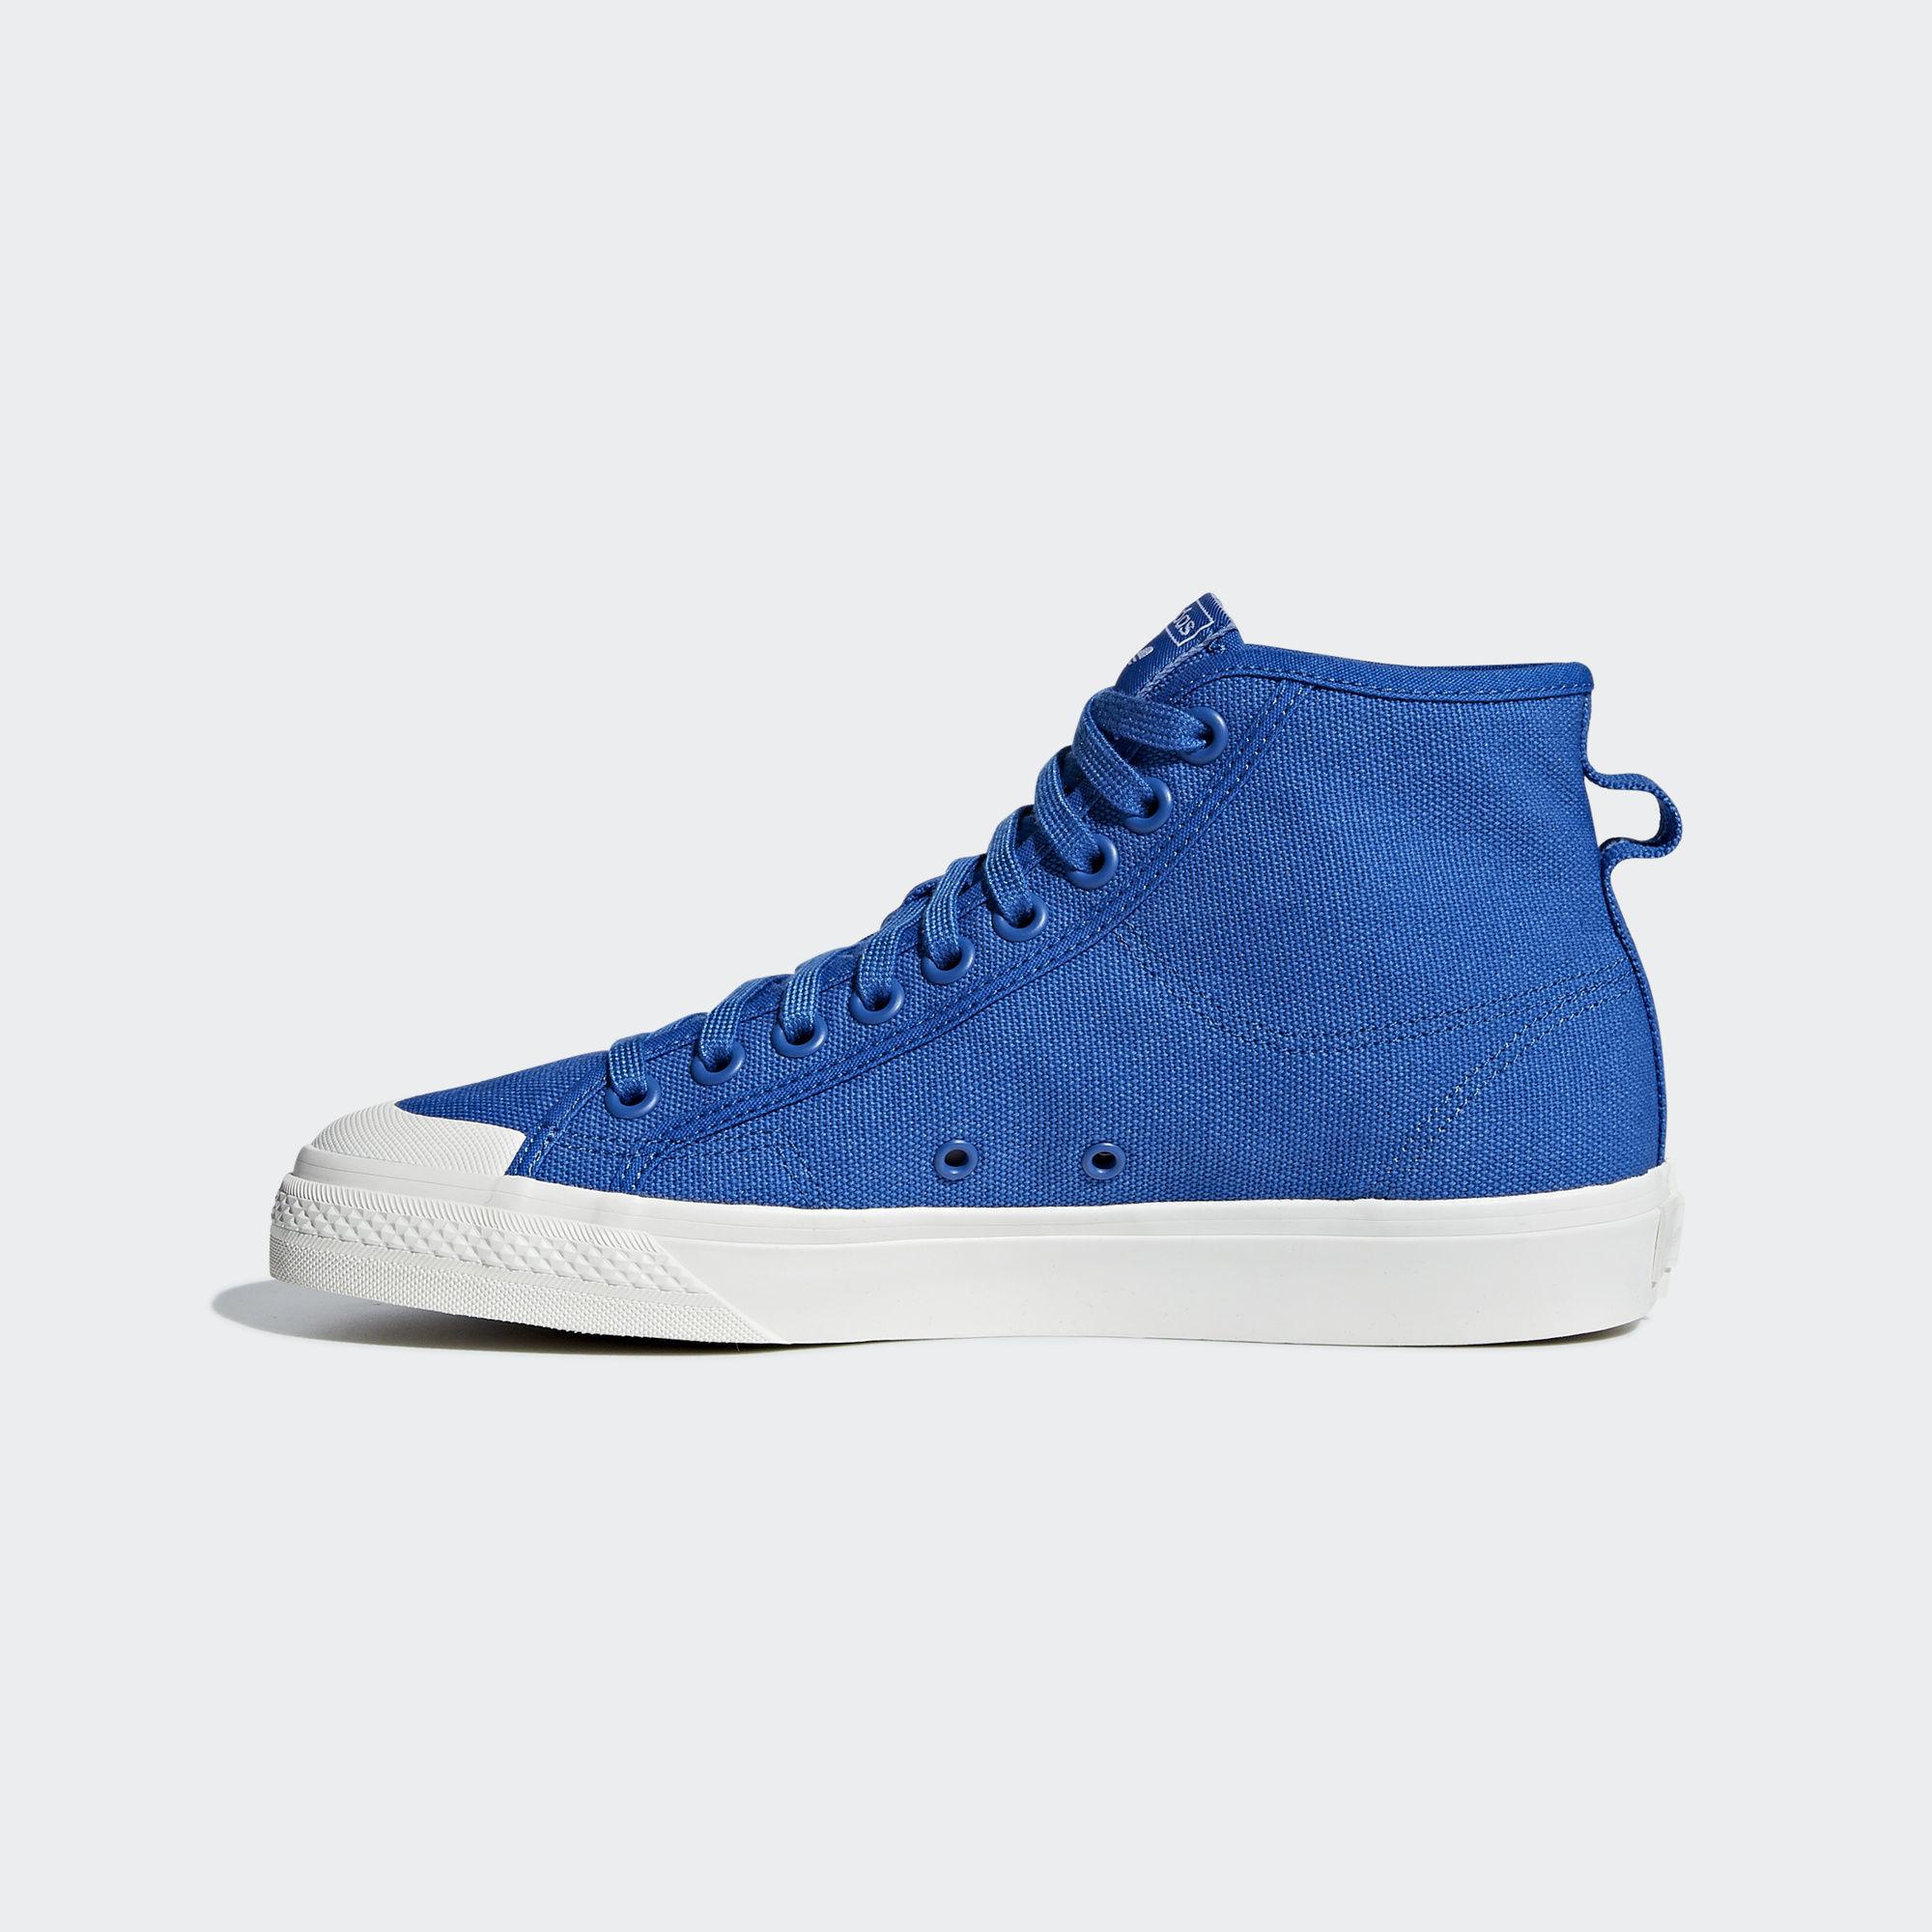 Adidas Nizza High Top Blue / Blue / Off White (B41644)